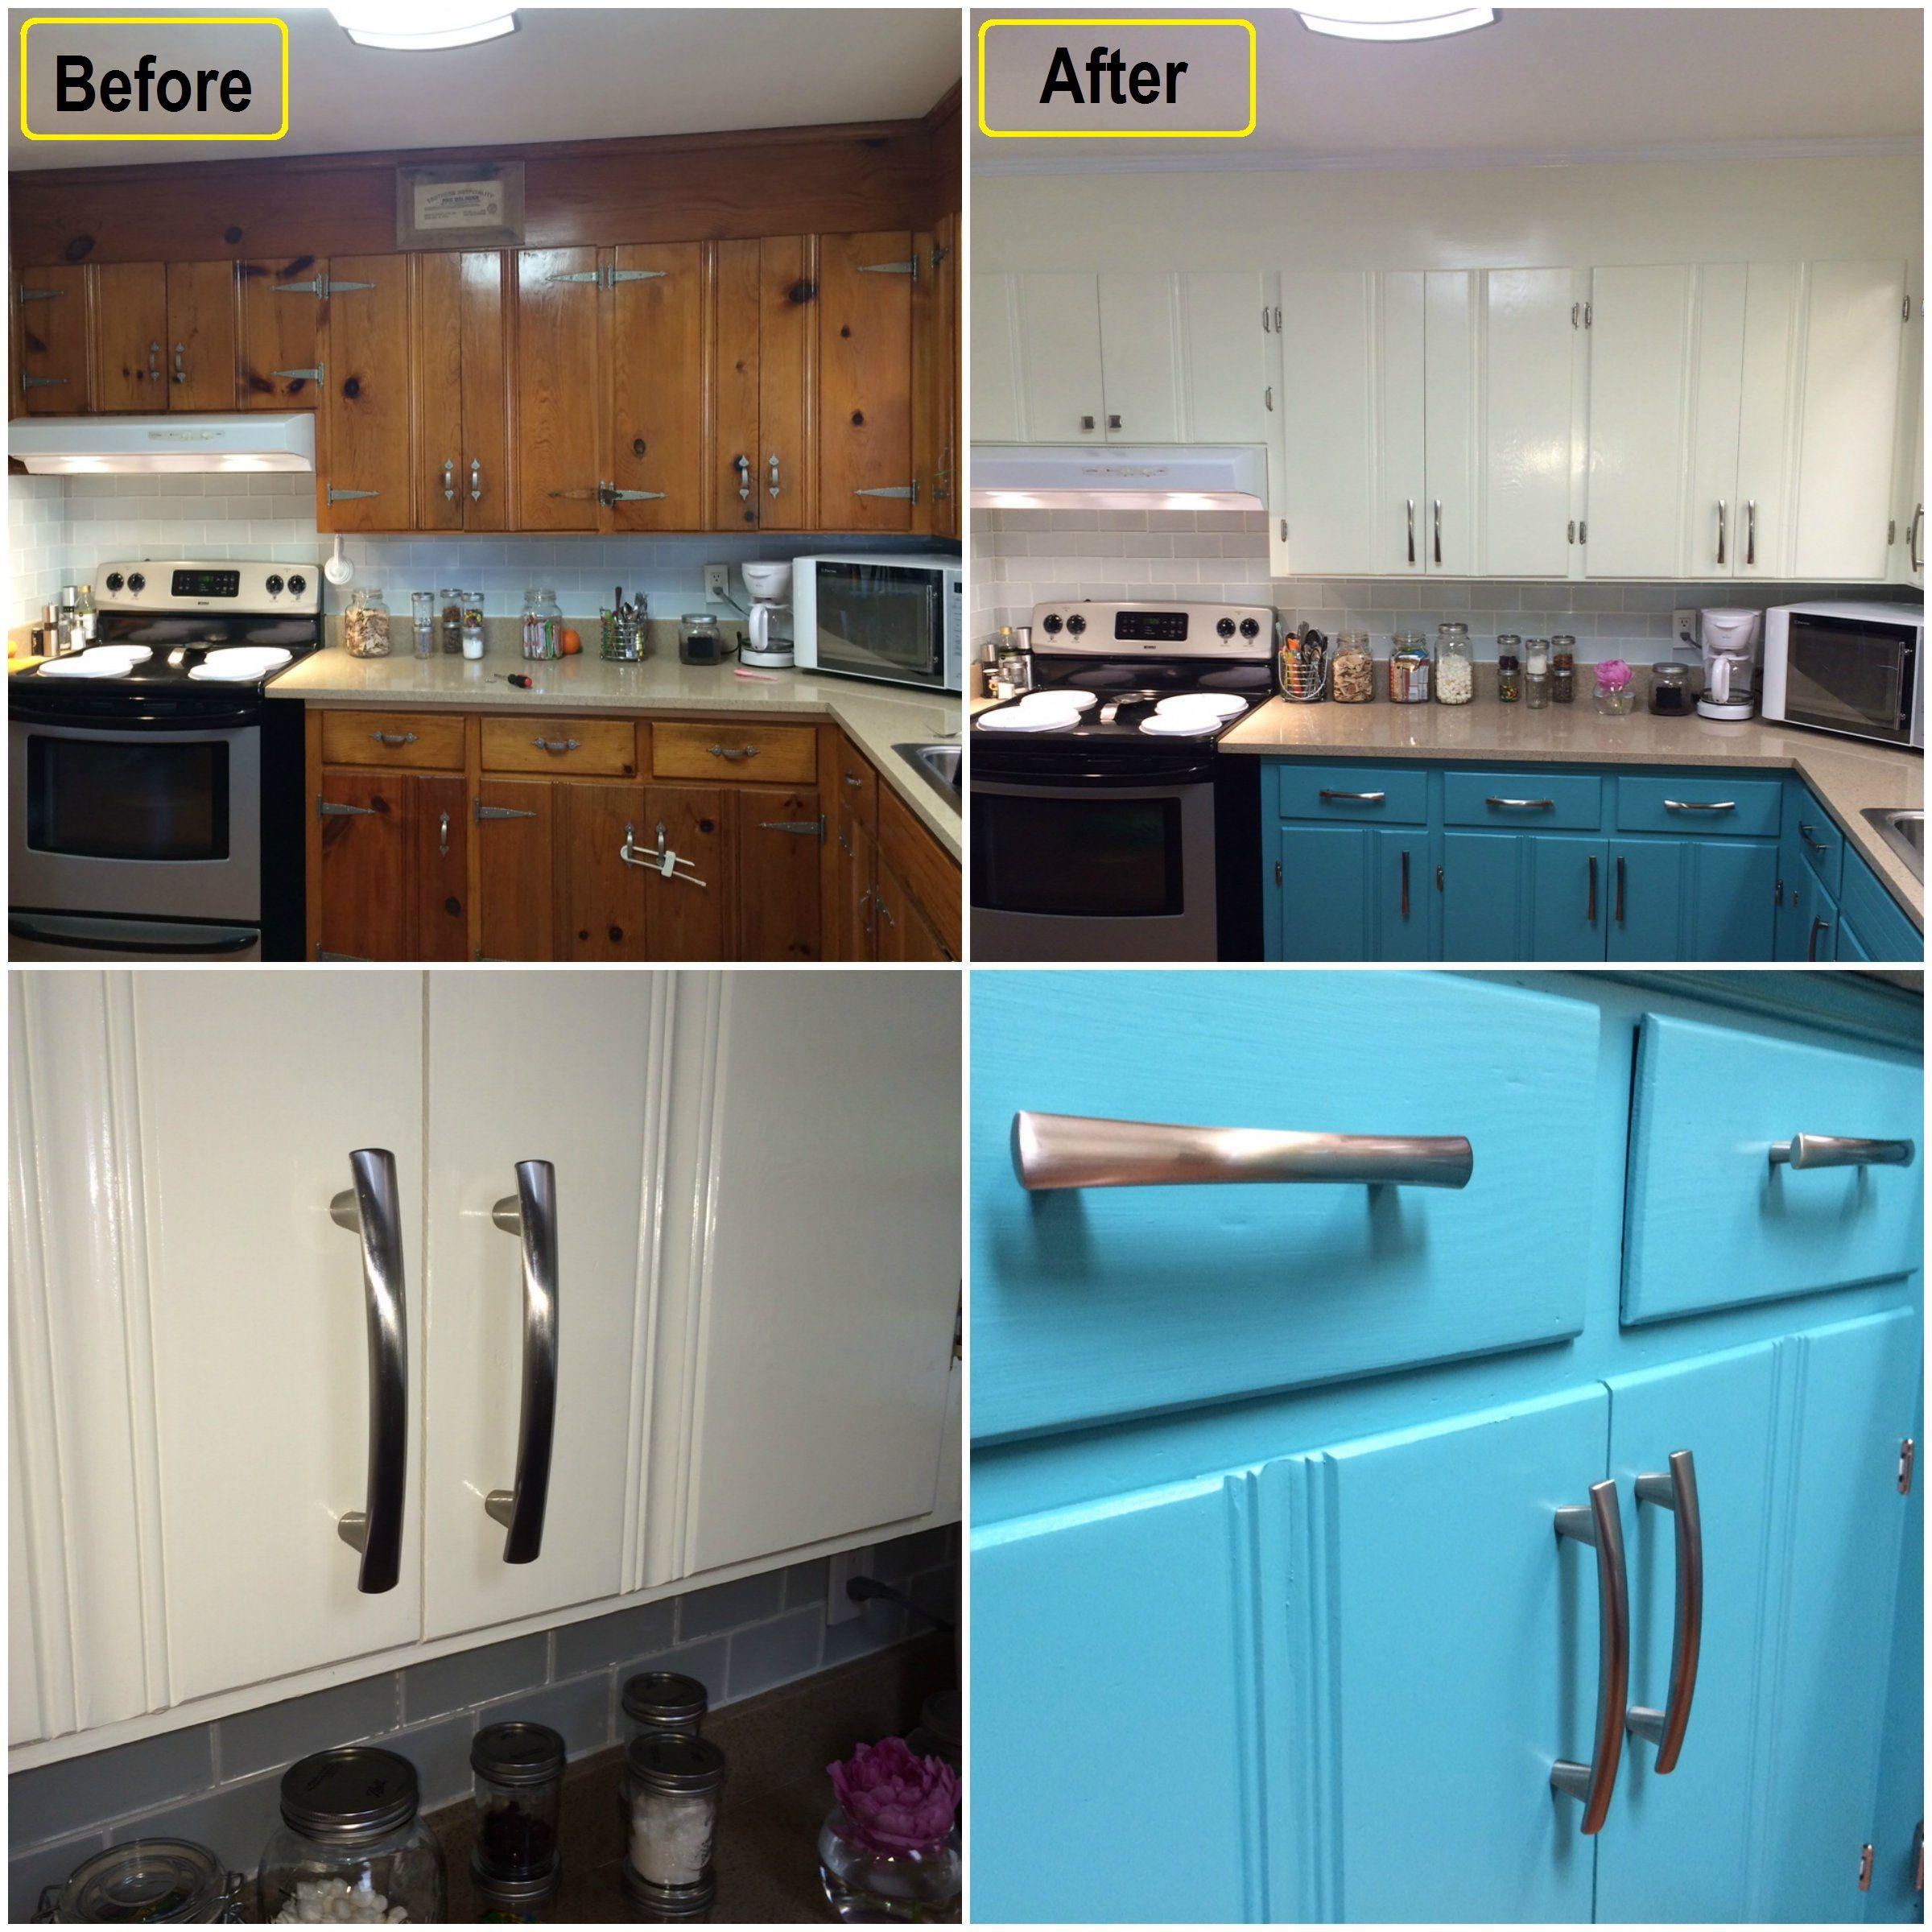 Painting Knotty Pine Cabinets Knotty Pine Kitchen Makeover To Modern Chic Kitchen New Kitchen